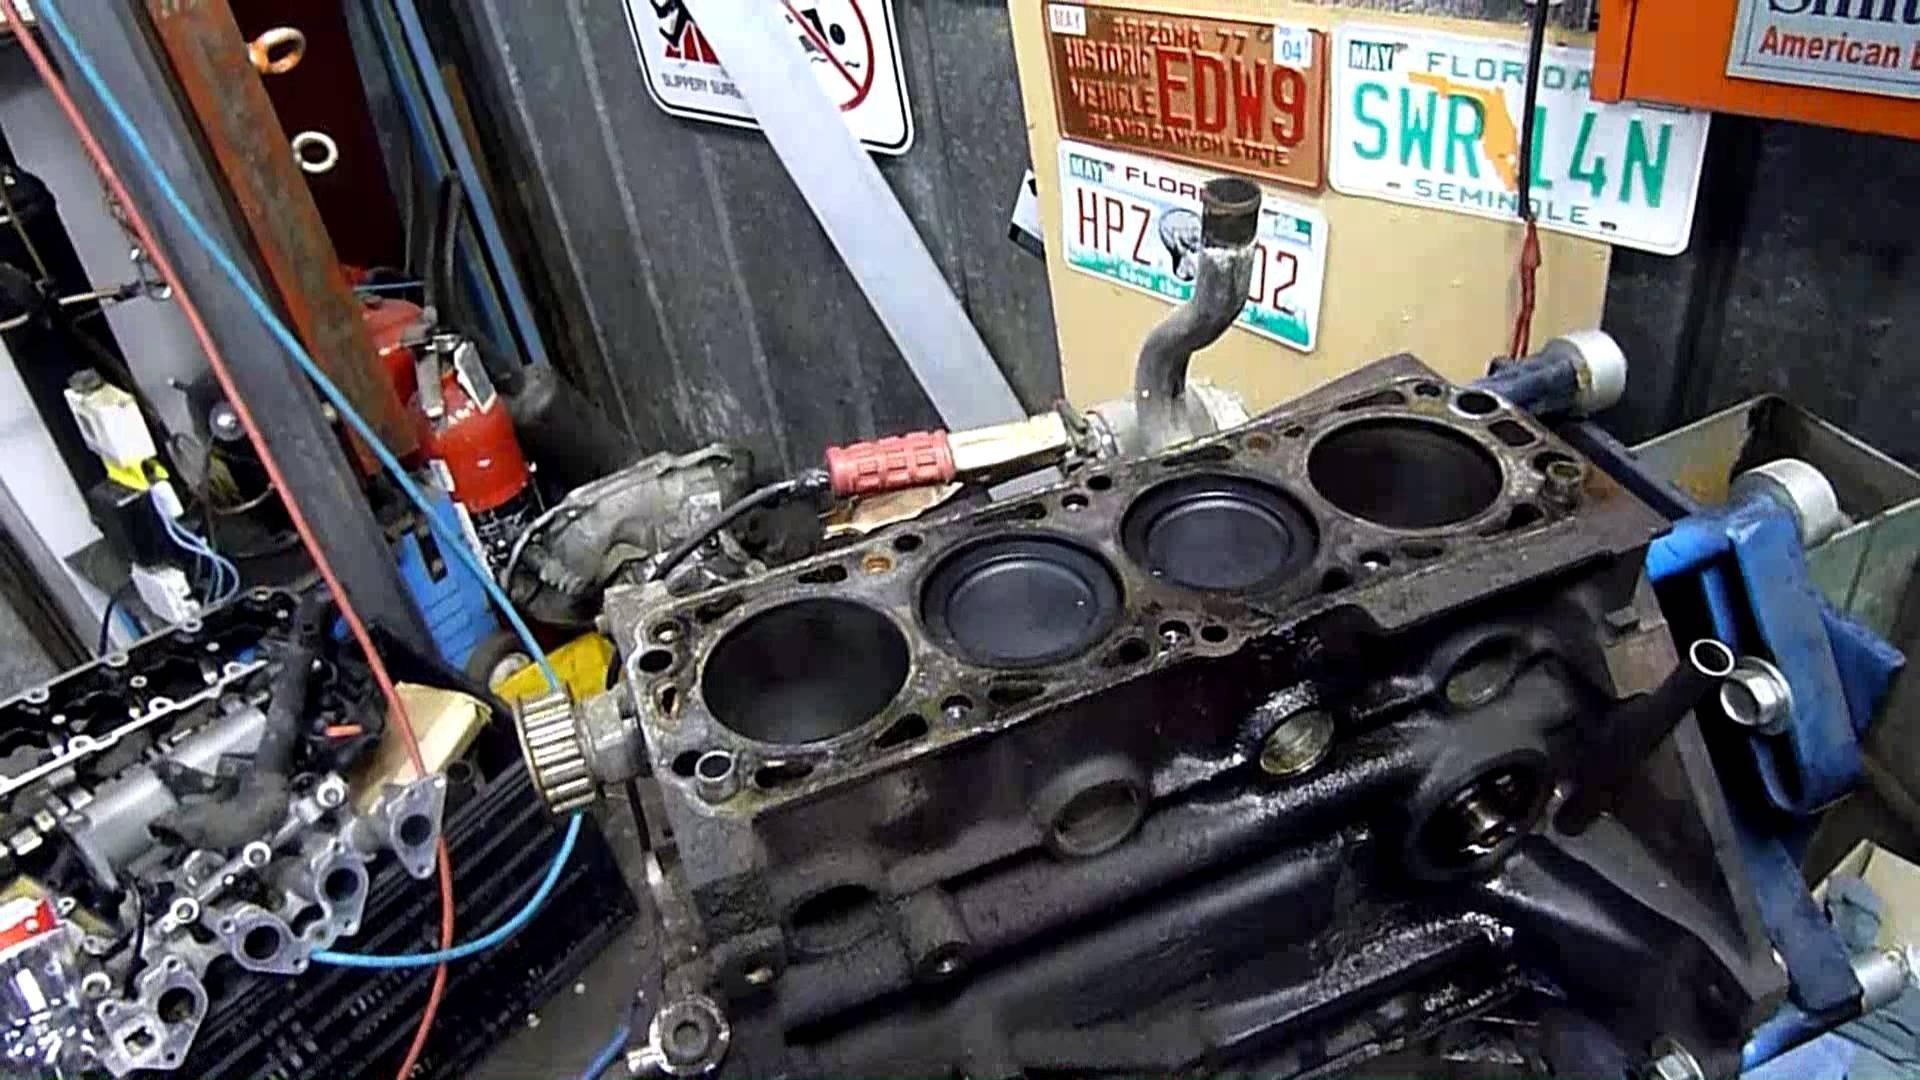 Daewoo Lanos Engine Diagram Daewoo Lanos Gm Family 1 Engine Autopsy Pt5 Head and Oil Pump Of Daewoo Lanos Engine Diagram